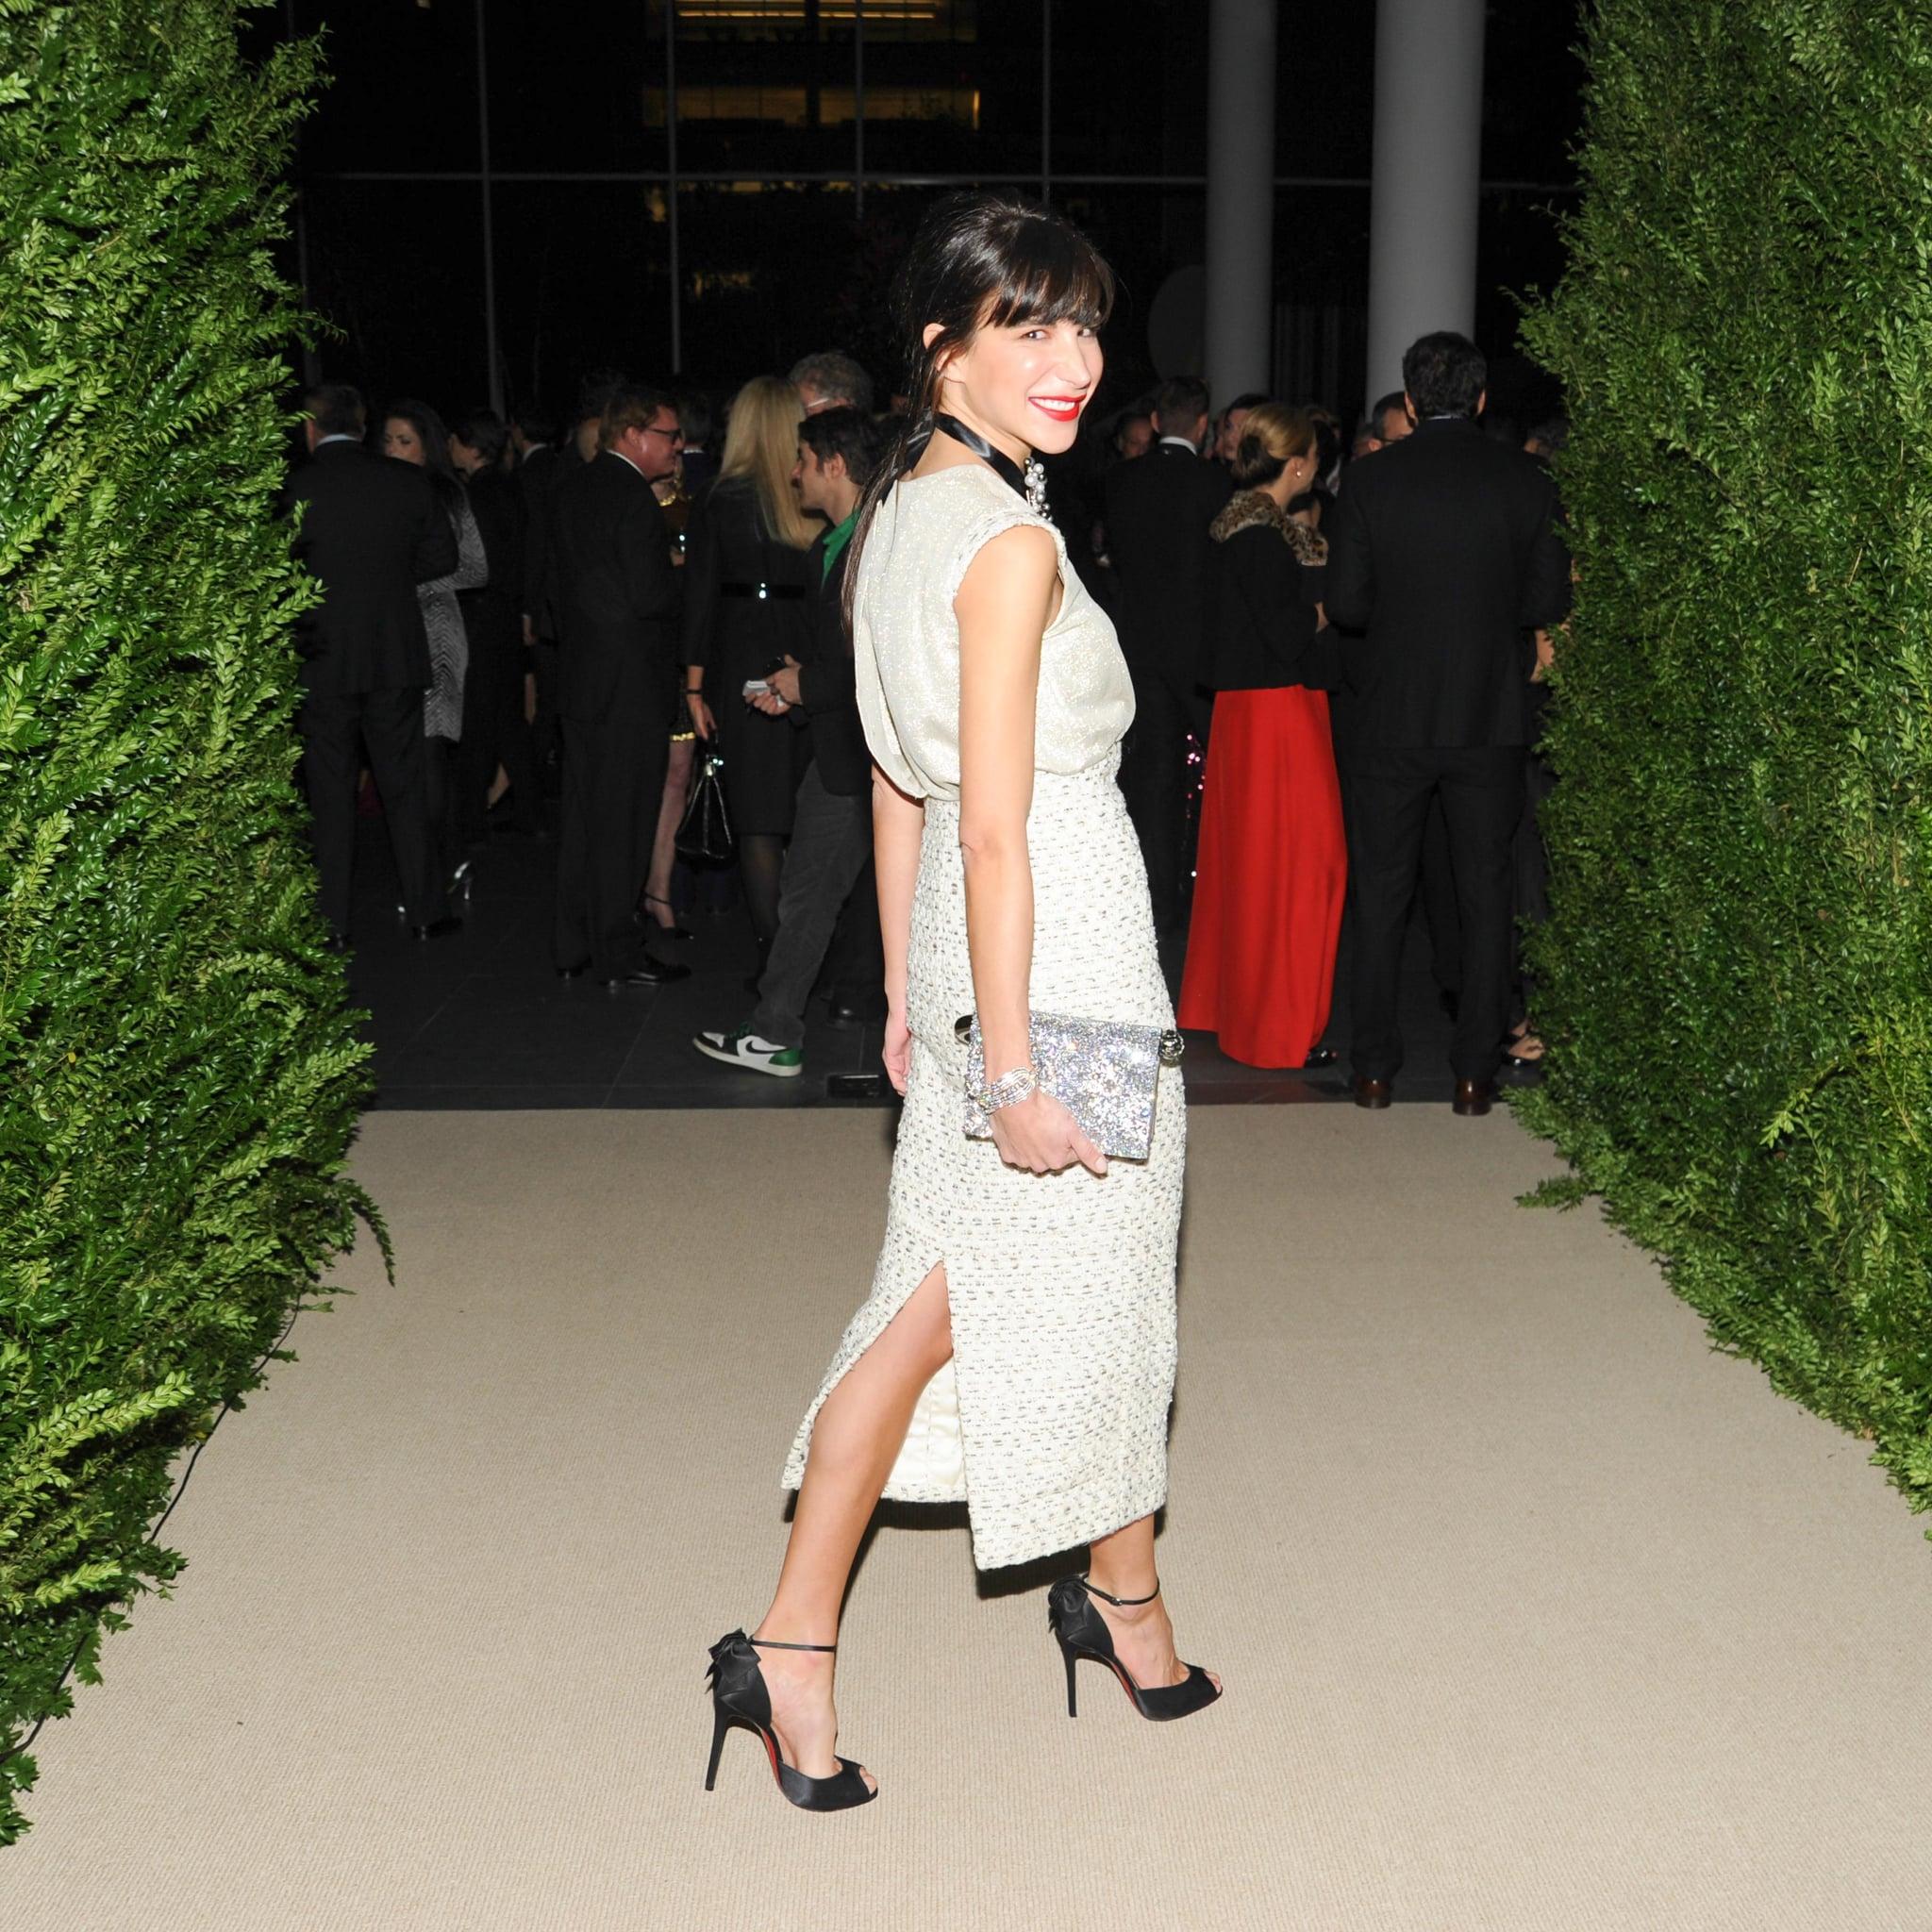 Caroline Sieber arrived for the MoMA bash in a high-contrast ensemble.